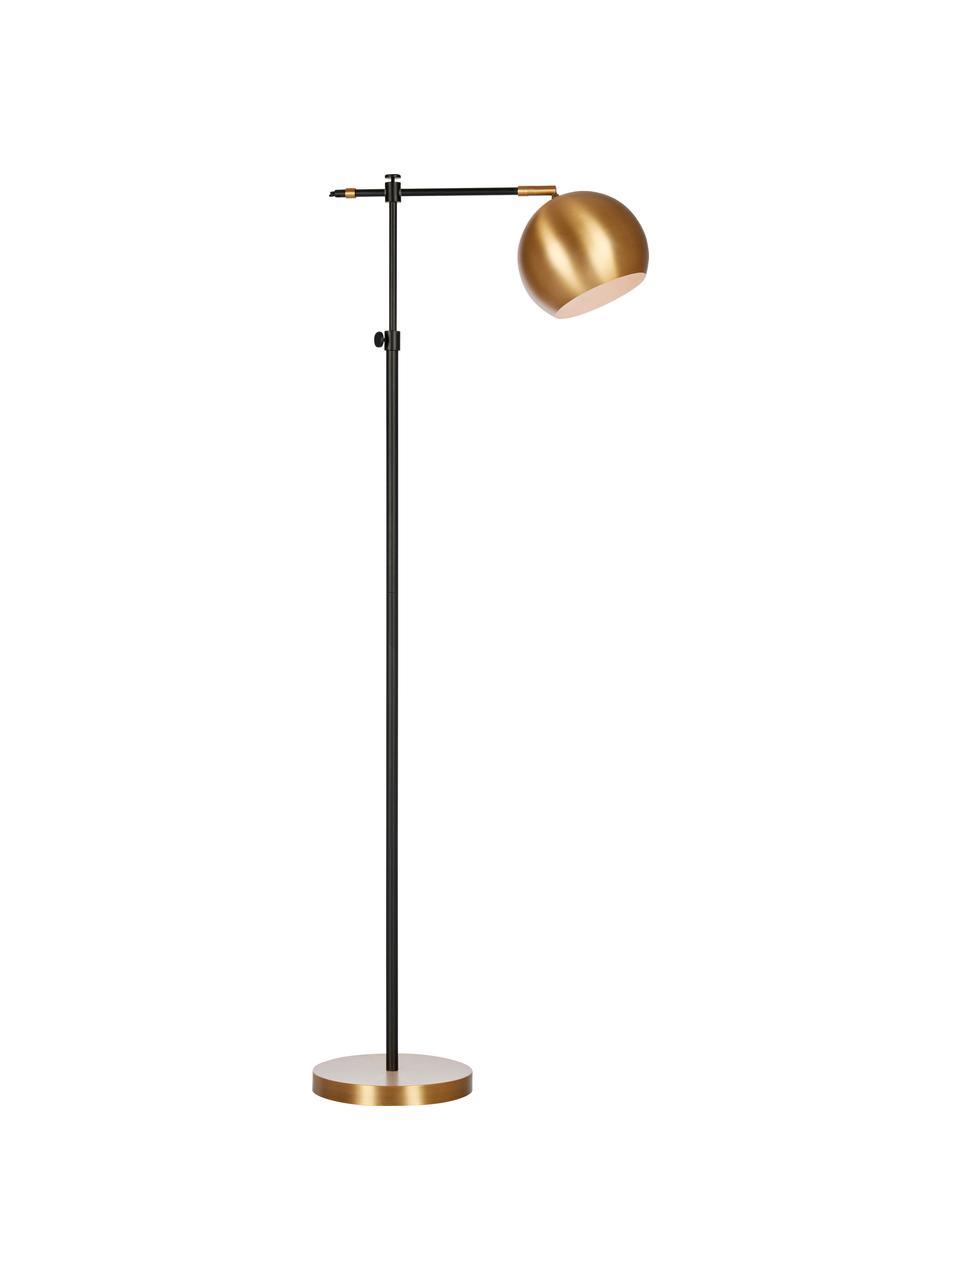 Industrial-Leselampe Chester aus Metall, Gestell: Messing, lackiert, Lampenfuß: Messing, Braun, Schwarz, 25 x 135 cm